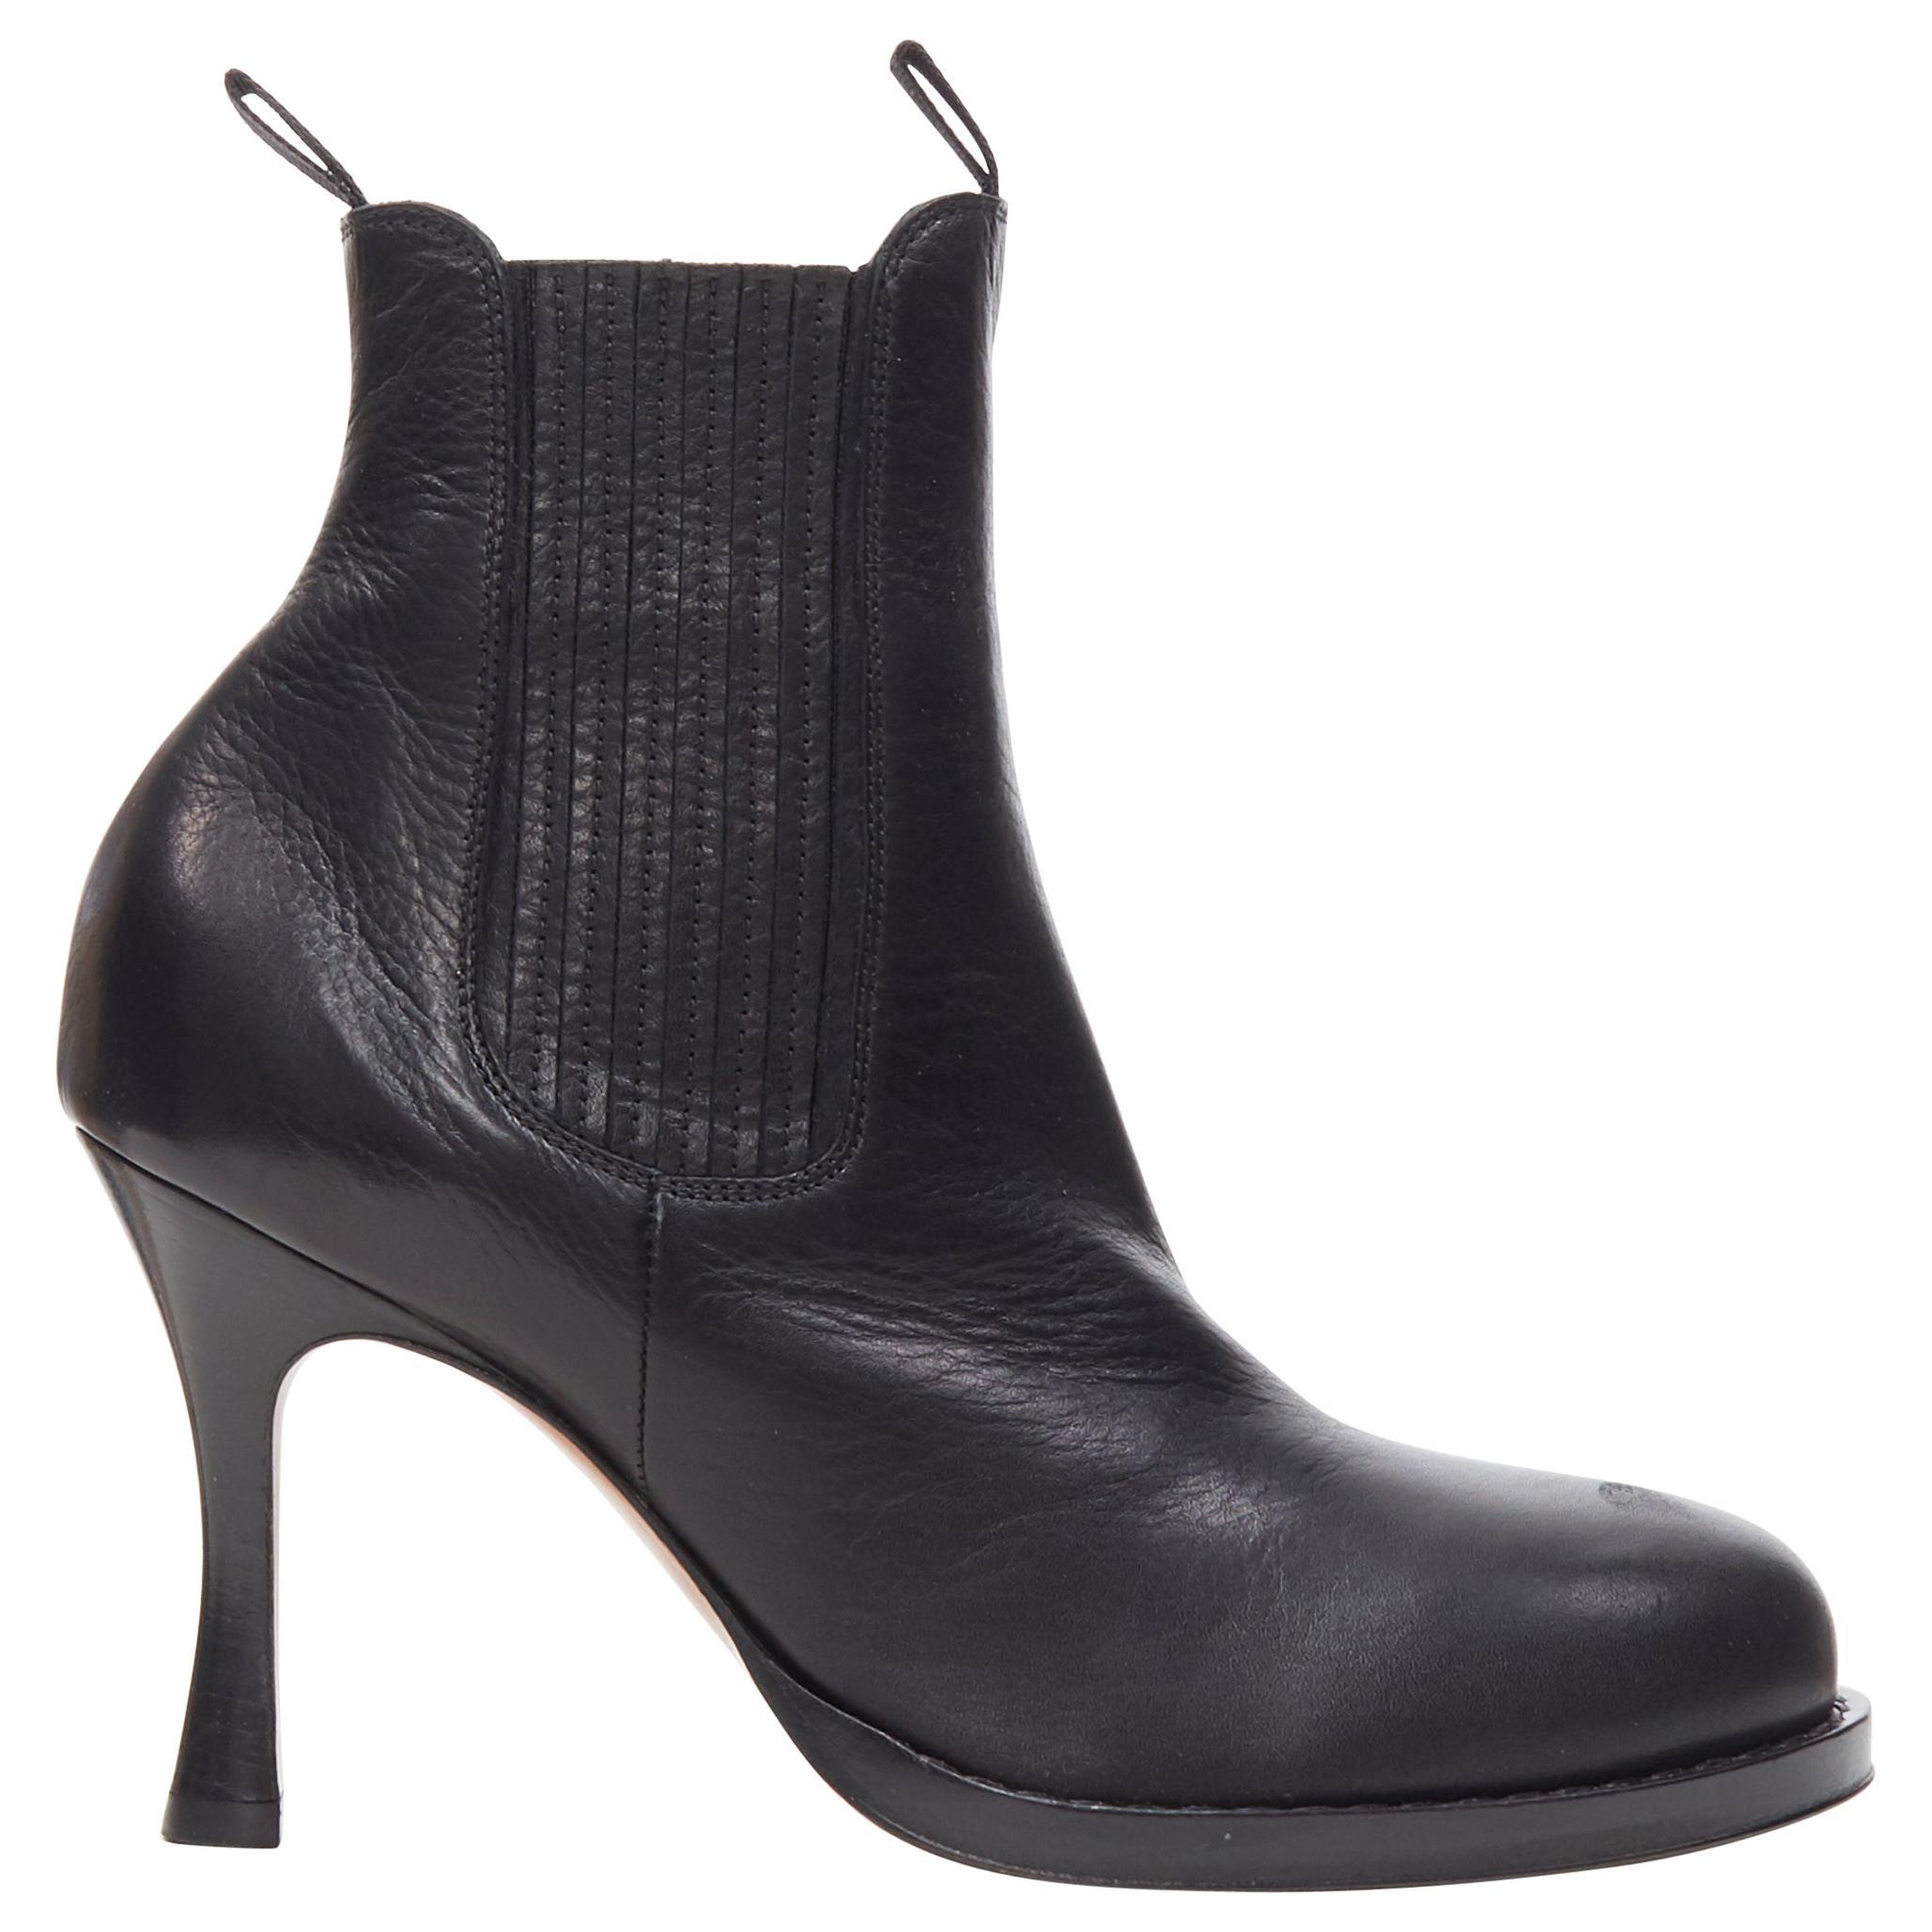 new OLD CELINE PHILO Chelsea Boot 85 black curved toe calfskin heel boots EU37